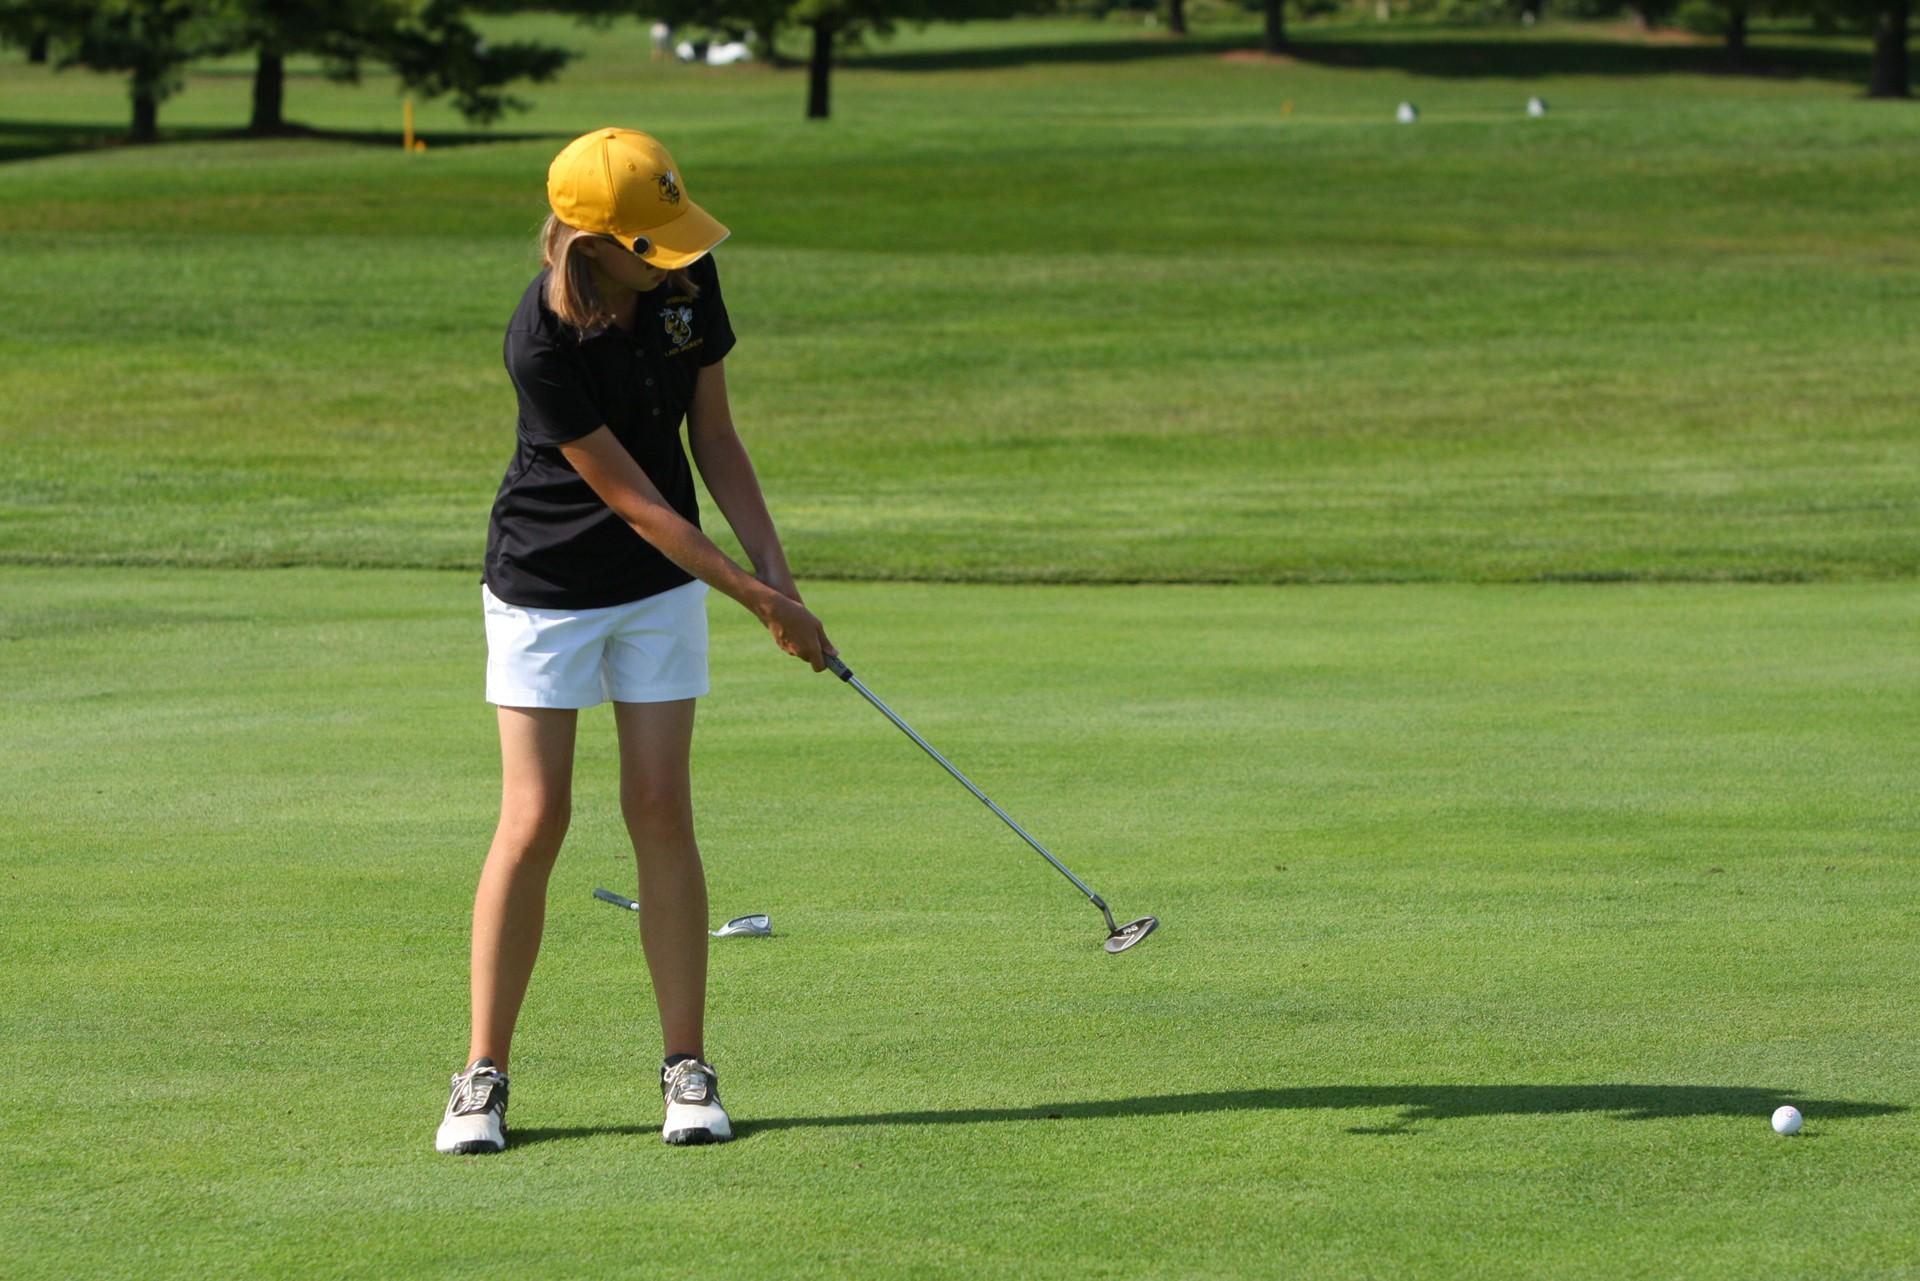 PHS student athlete putting a golf ball